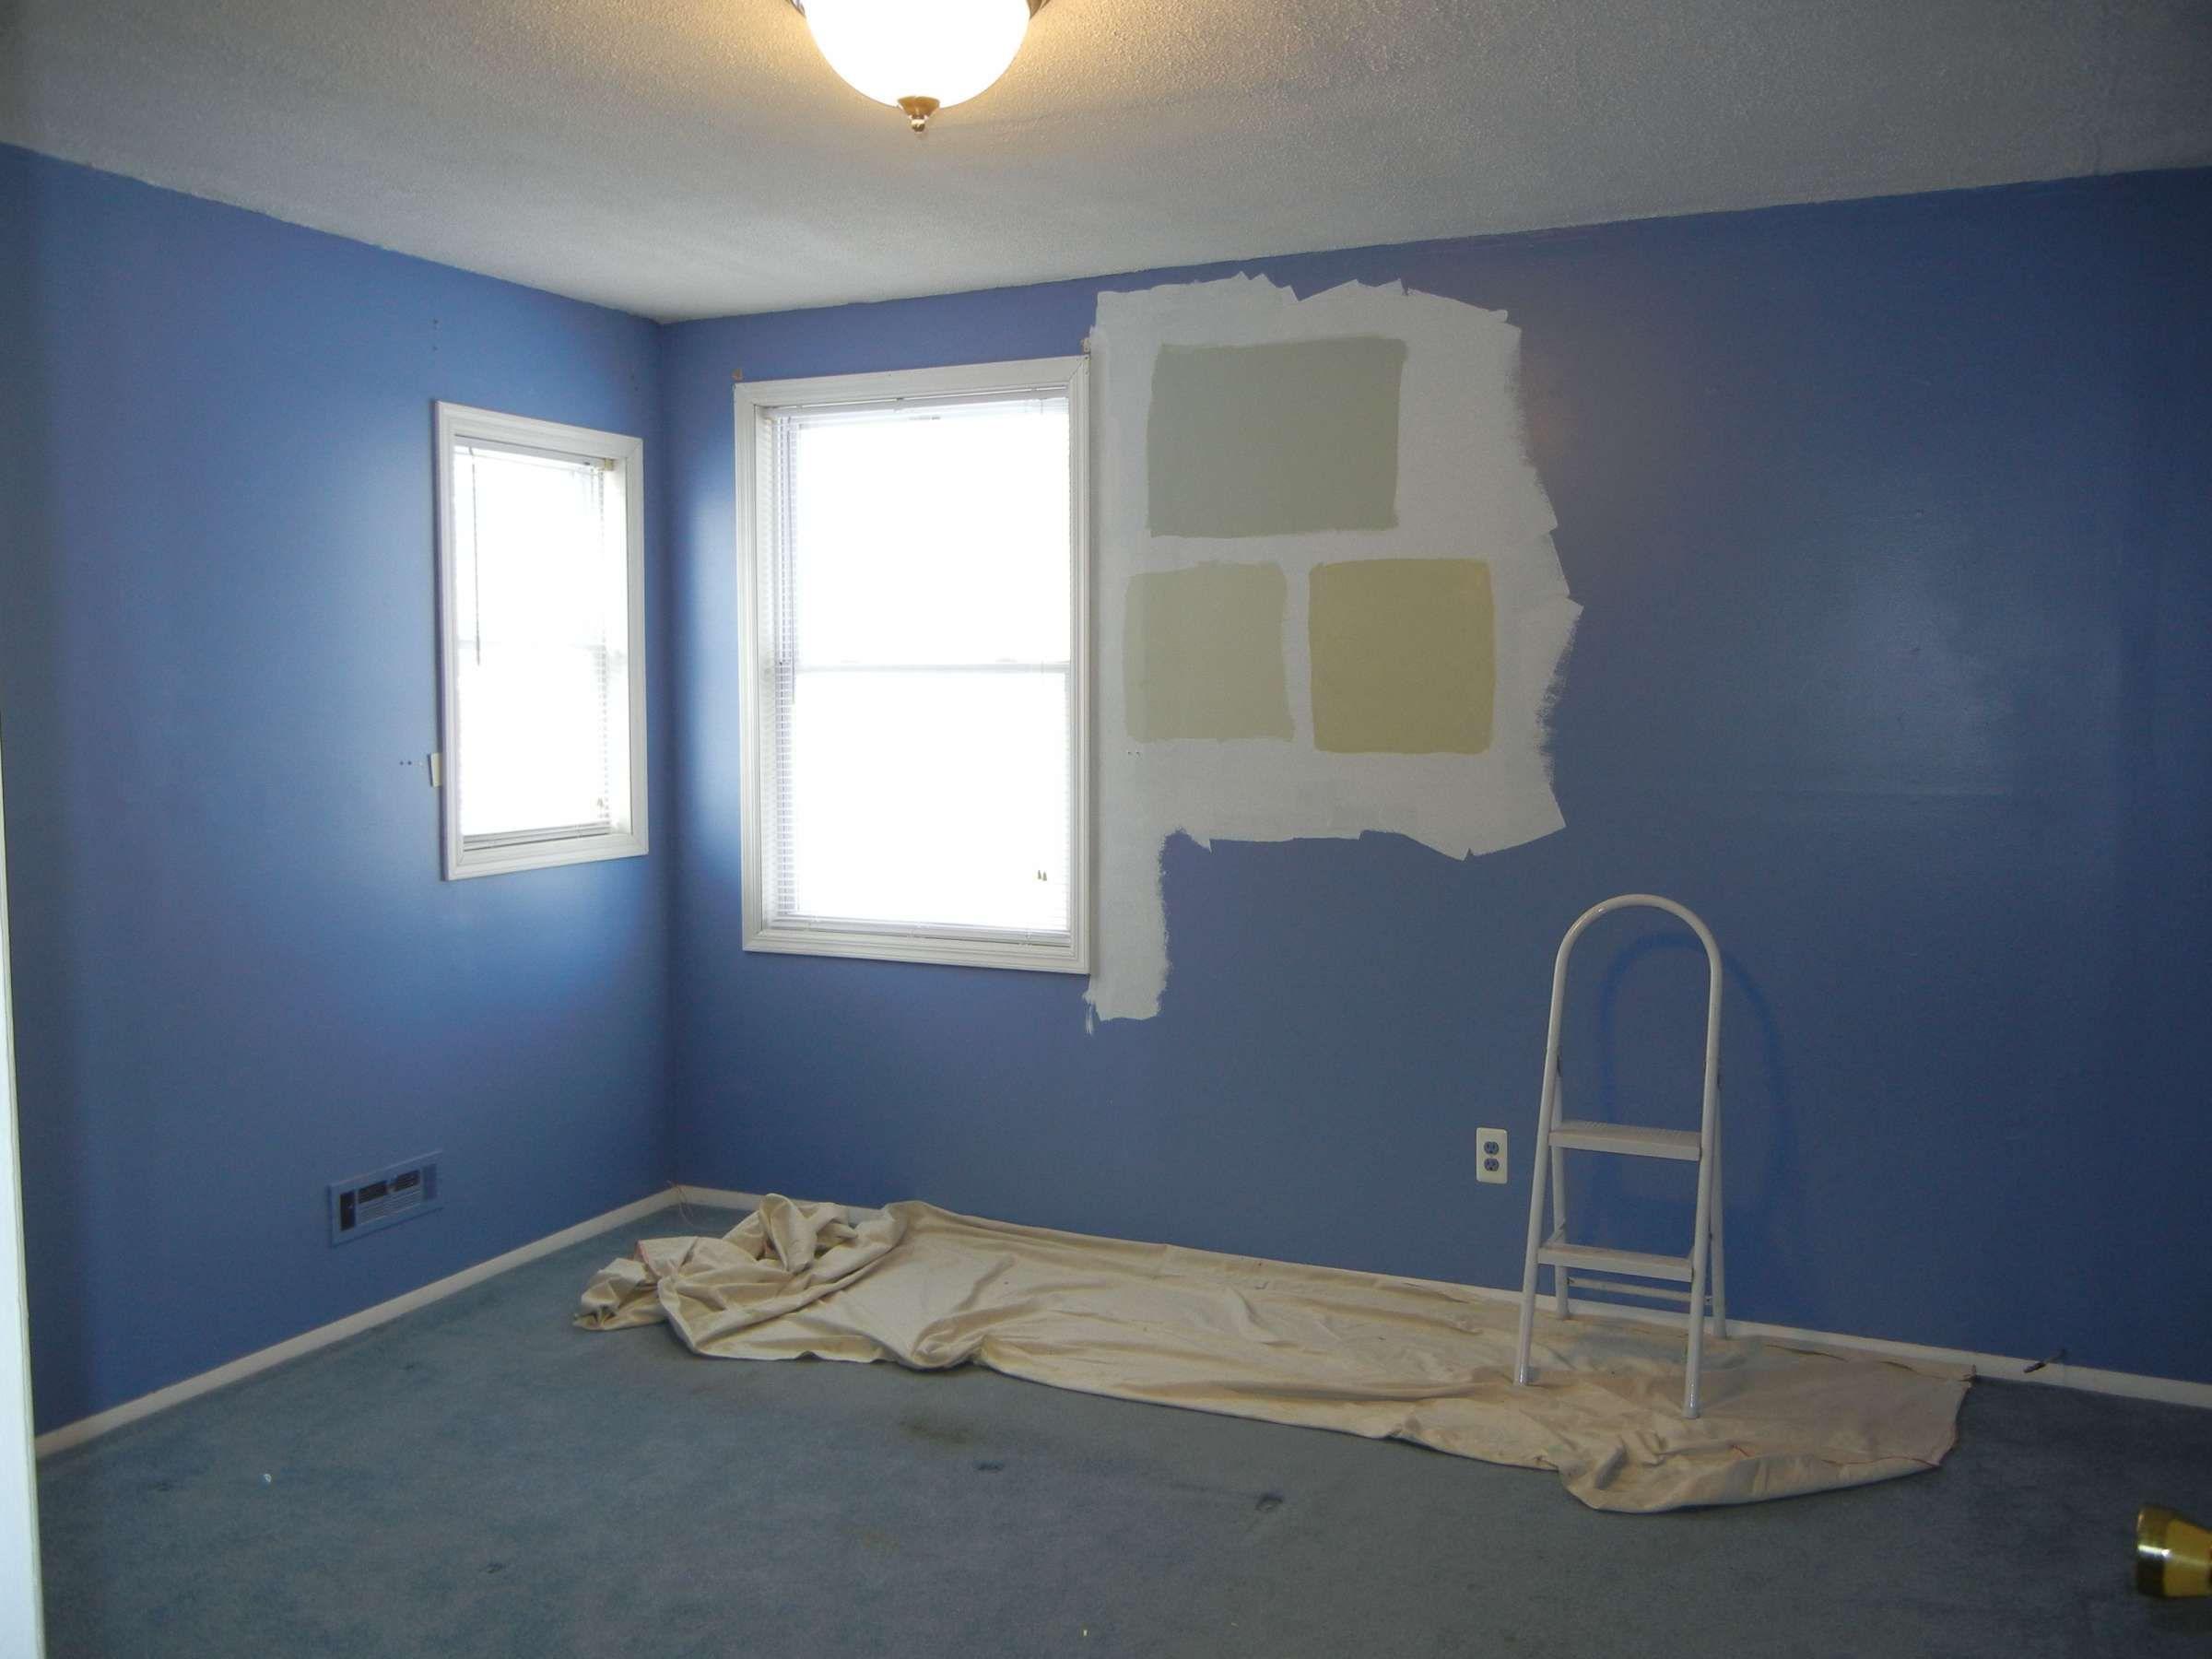 12 Wonderful Bedroom Color Schemes With Blue Carpet Gallery Blue Carpet Bedroom Bedroom Colors Blue Bedroom Walls